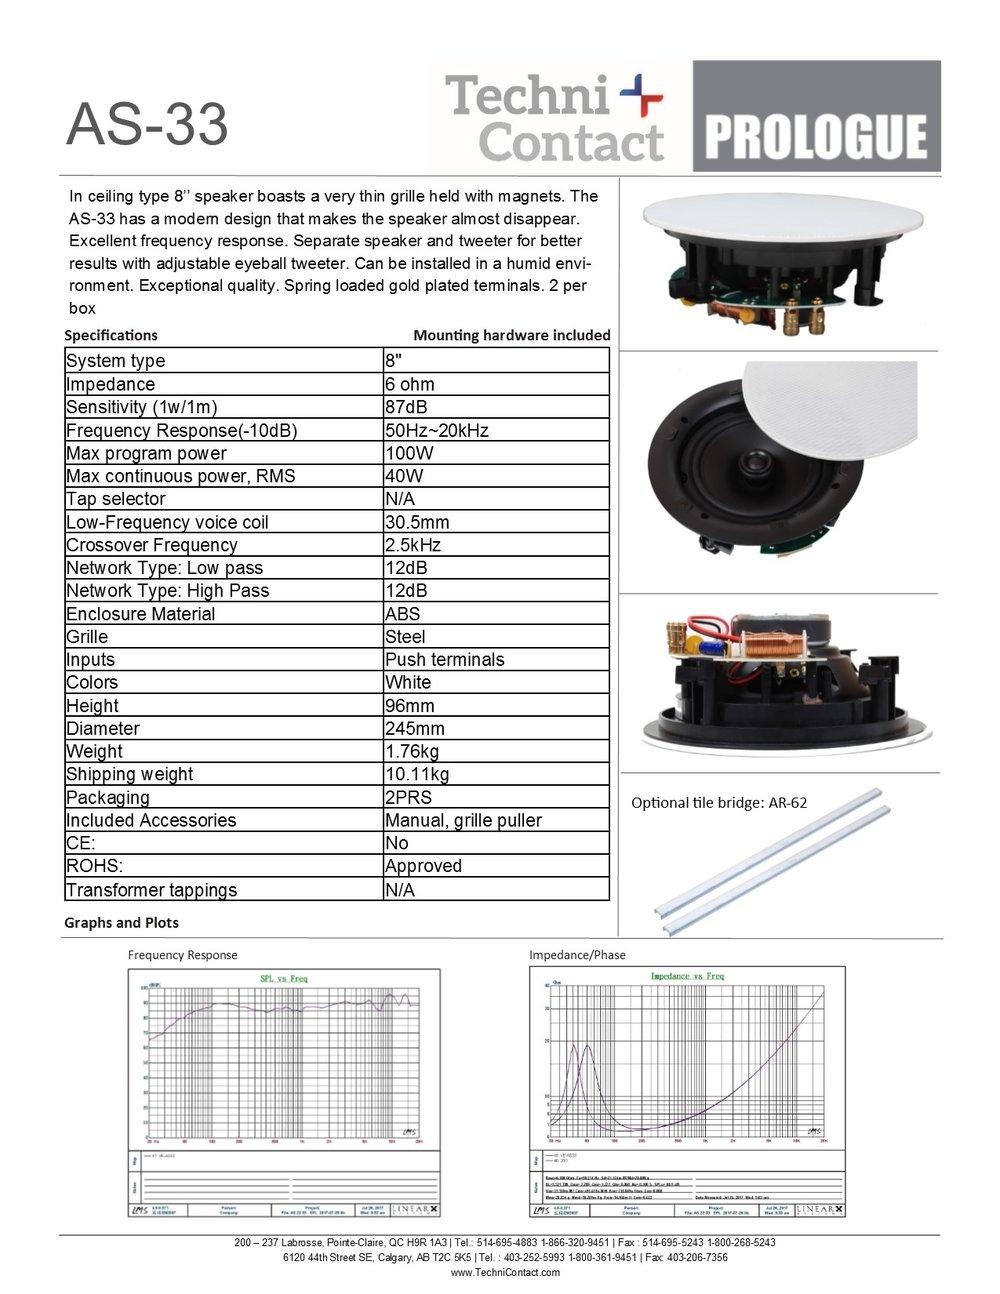 Specs Prologue Ceiling Speaker Wiring Diagram 6 As 33